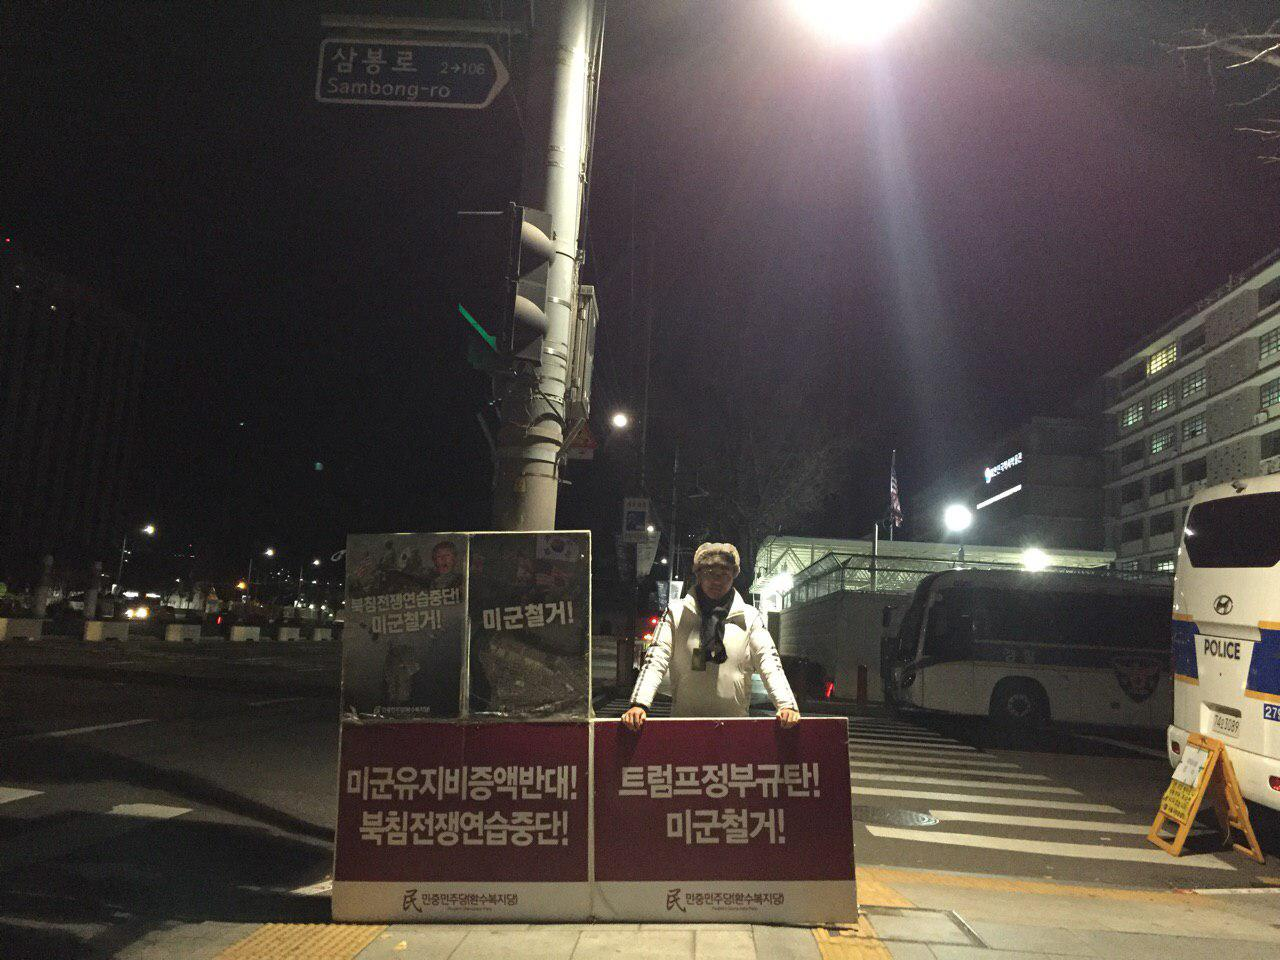 photo_2019-12-03_04-22-54.jpg